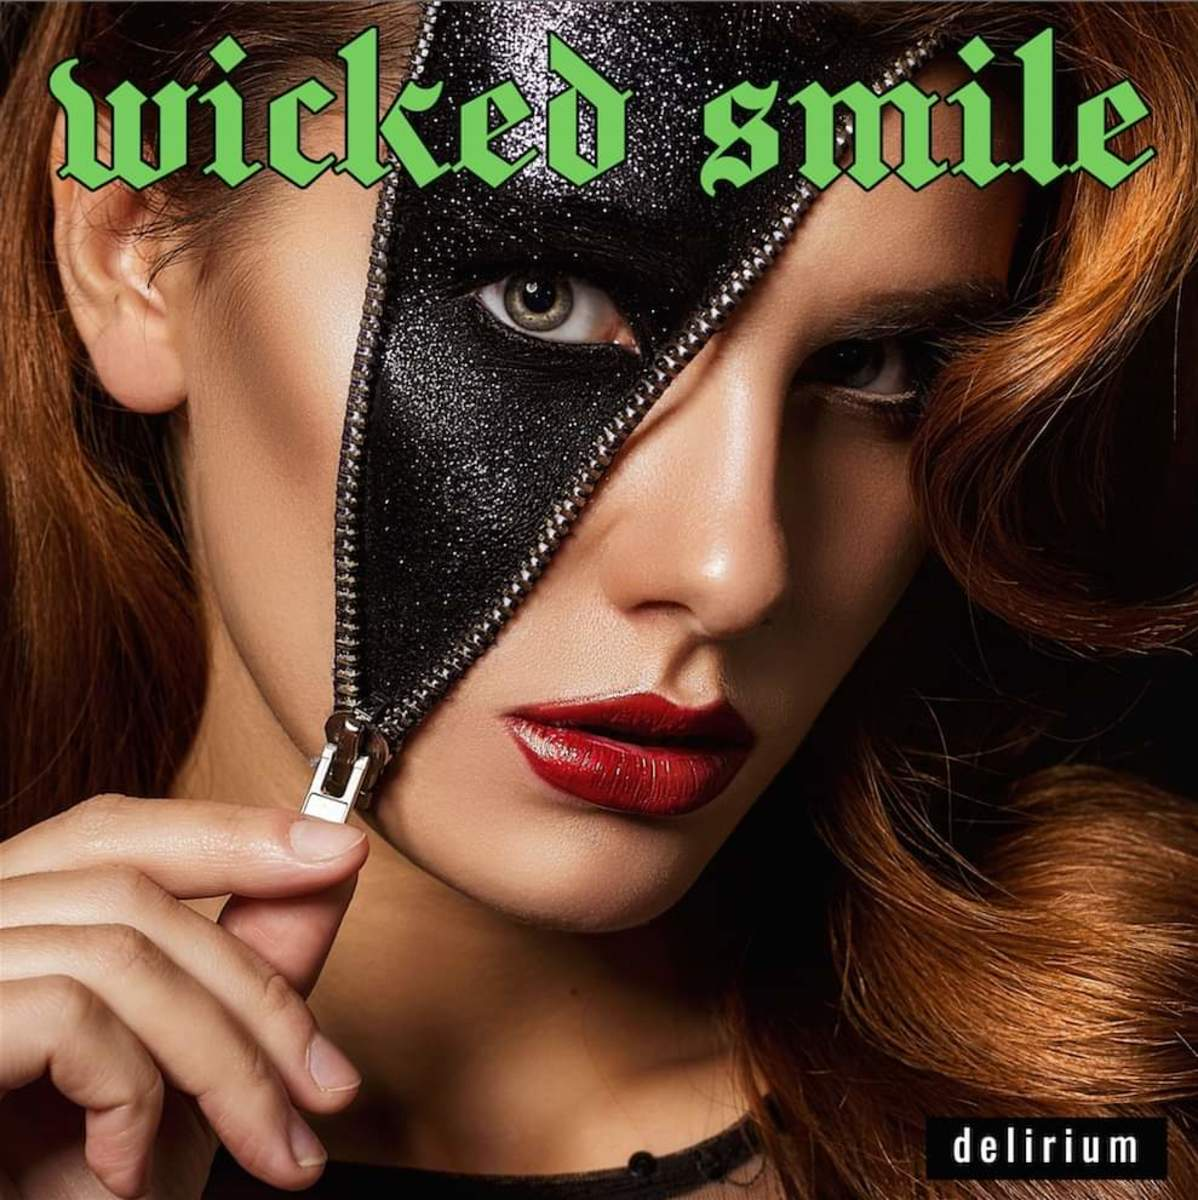 "Aussie Metal Update: Wicked Smile ""Delirium"" EP Review"